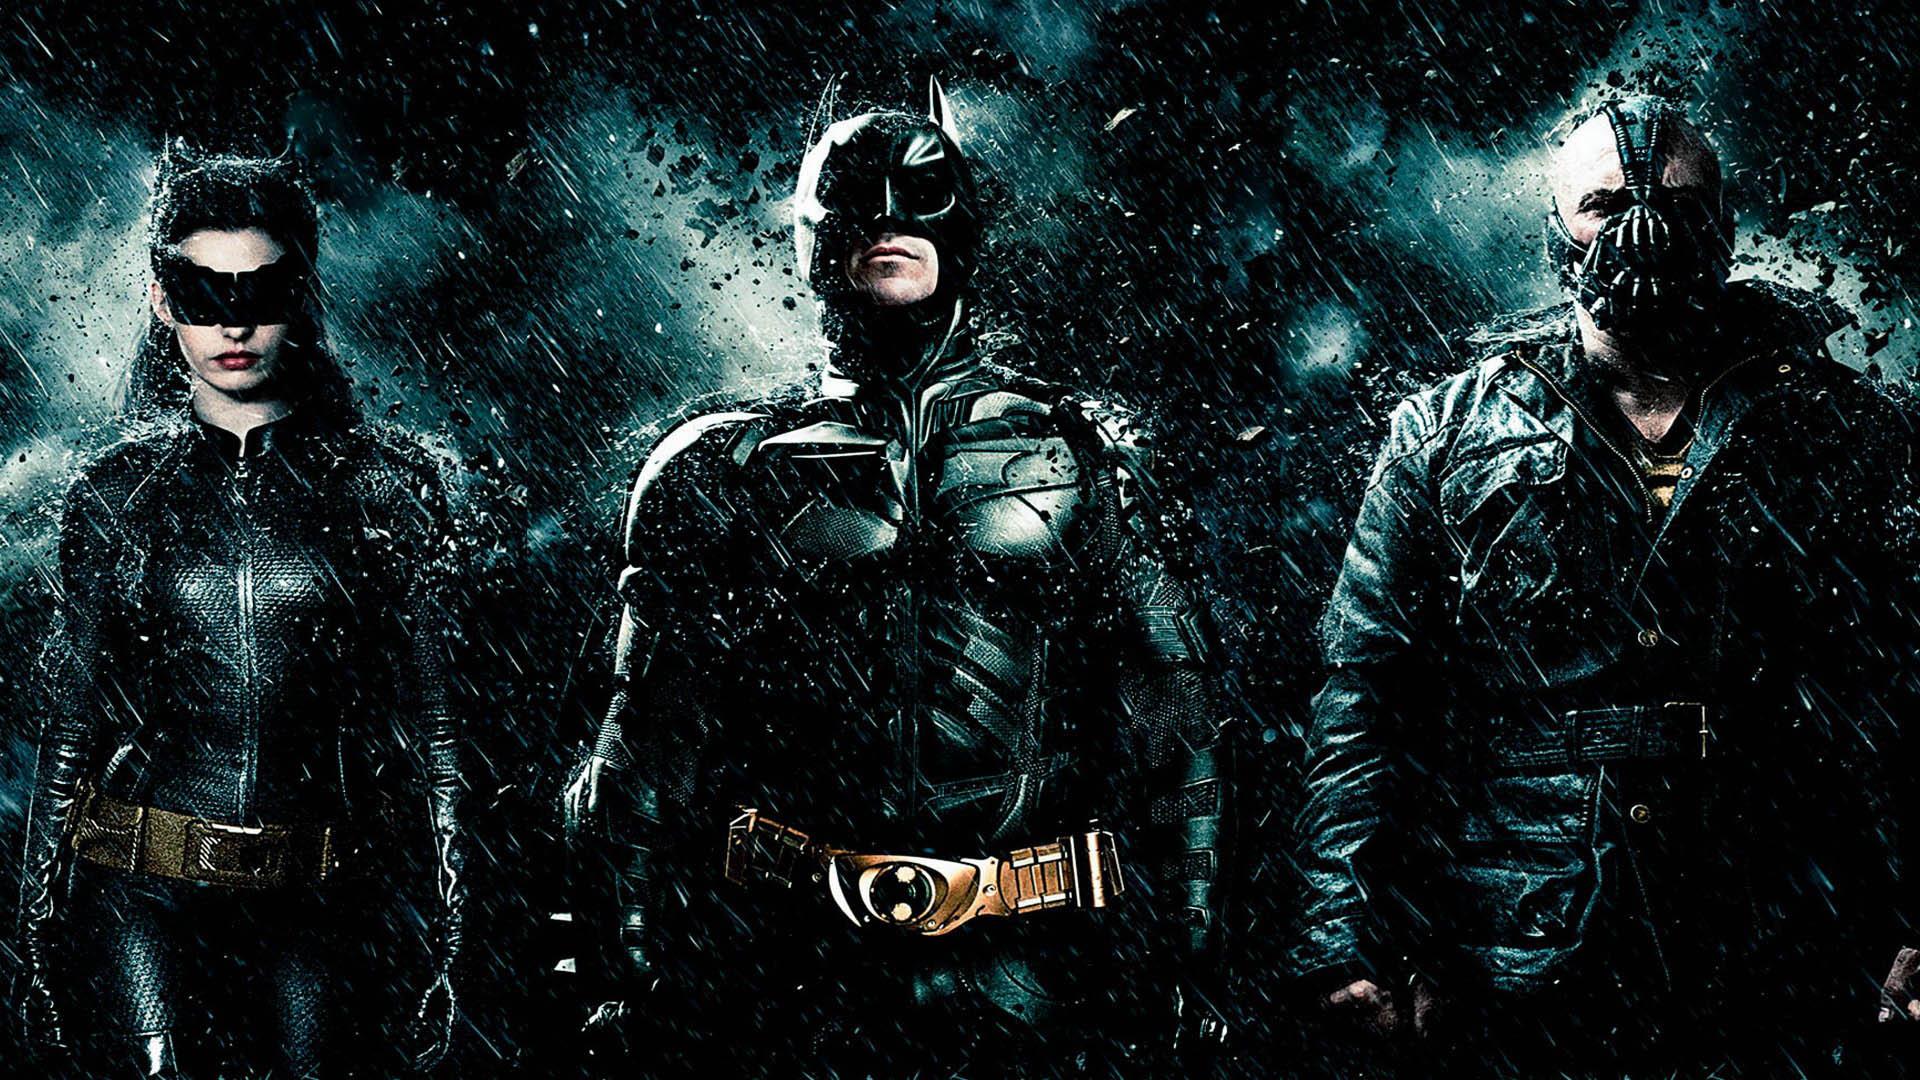 Bane batman dark knight rises #4164447, 3500x2188   all for desktop.